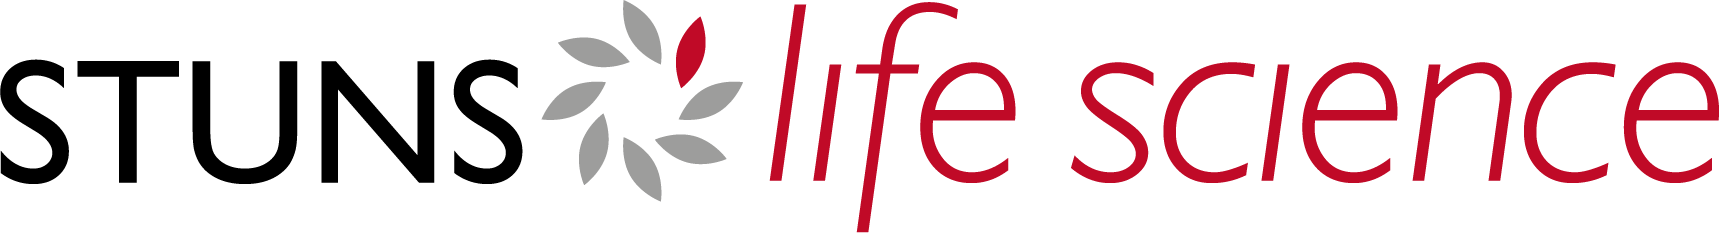 STUNS Life science